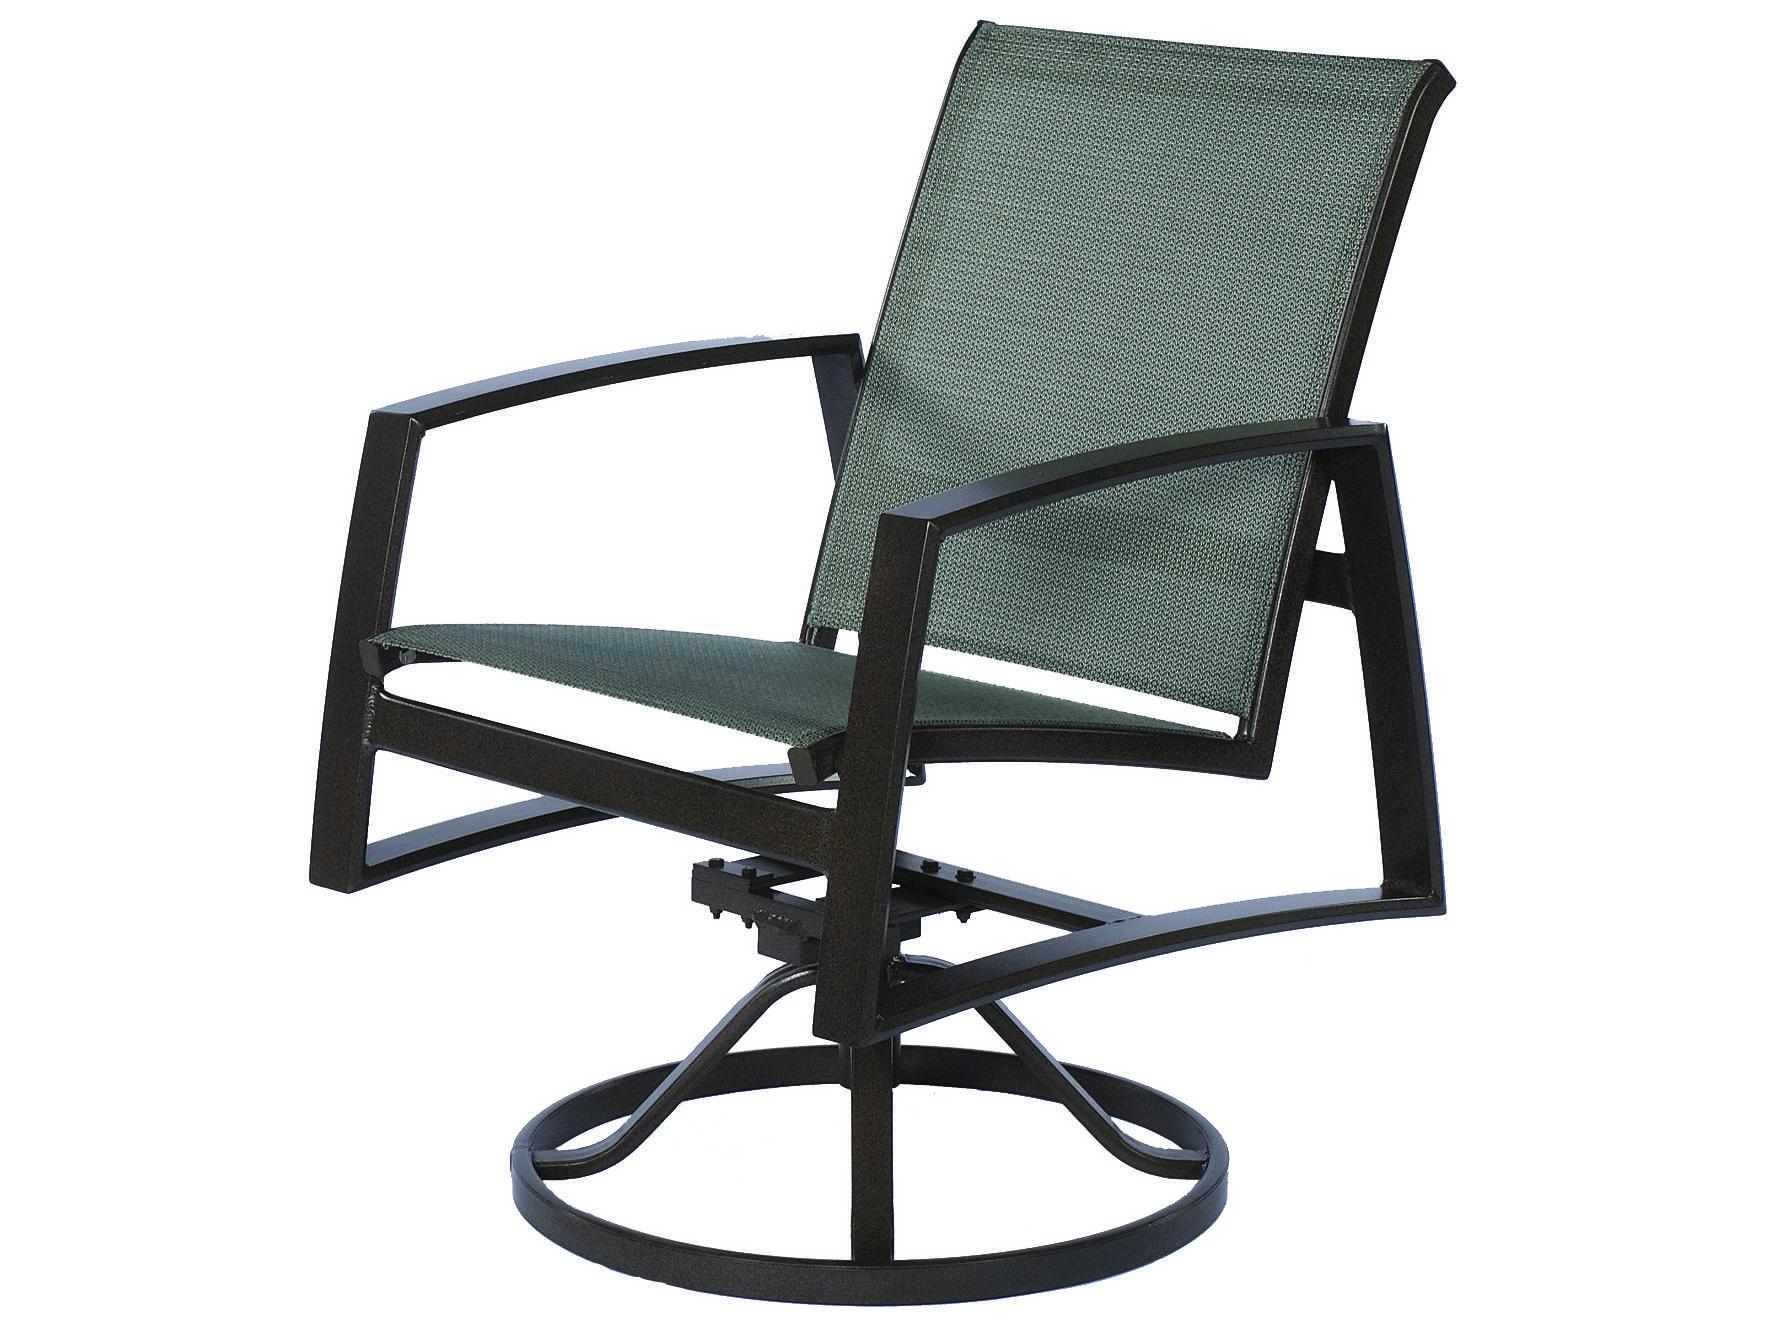 sling motion patio chairs cheap large bean bag suncoast vision cast aluminum arm swivel rocker